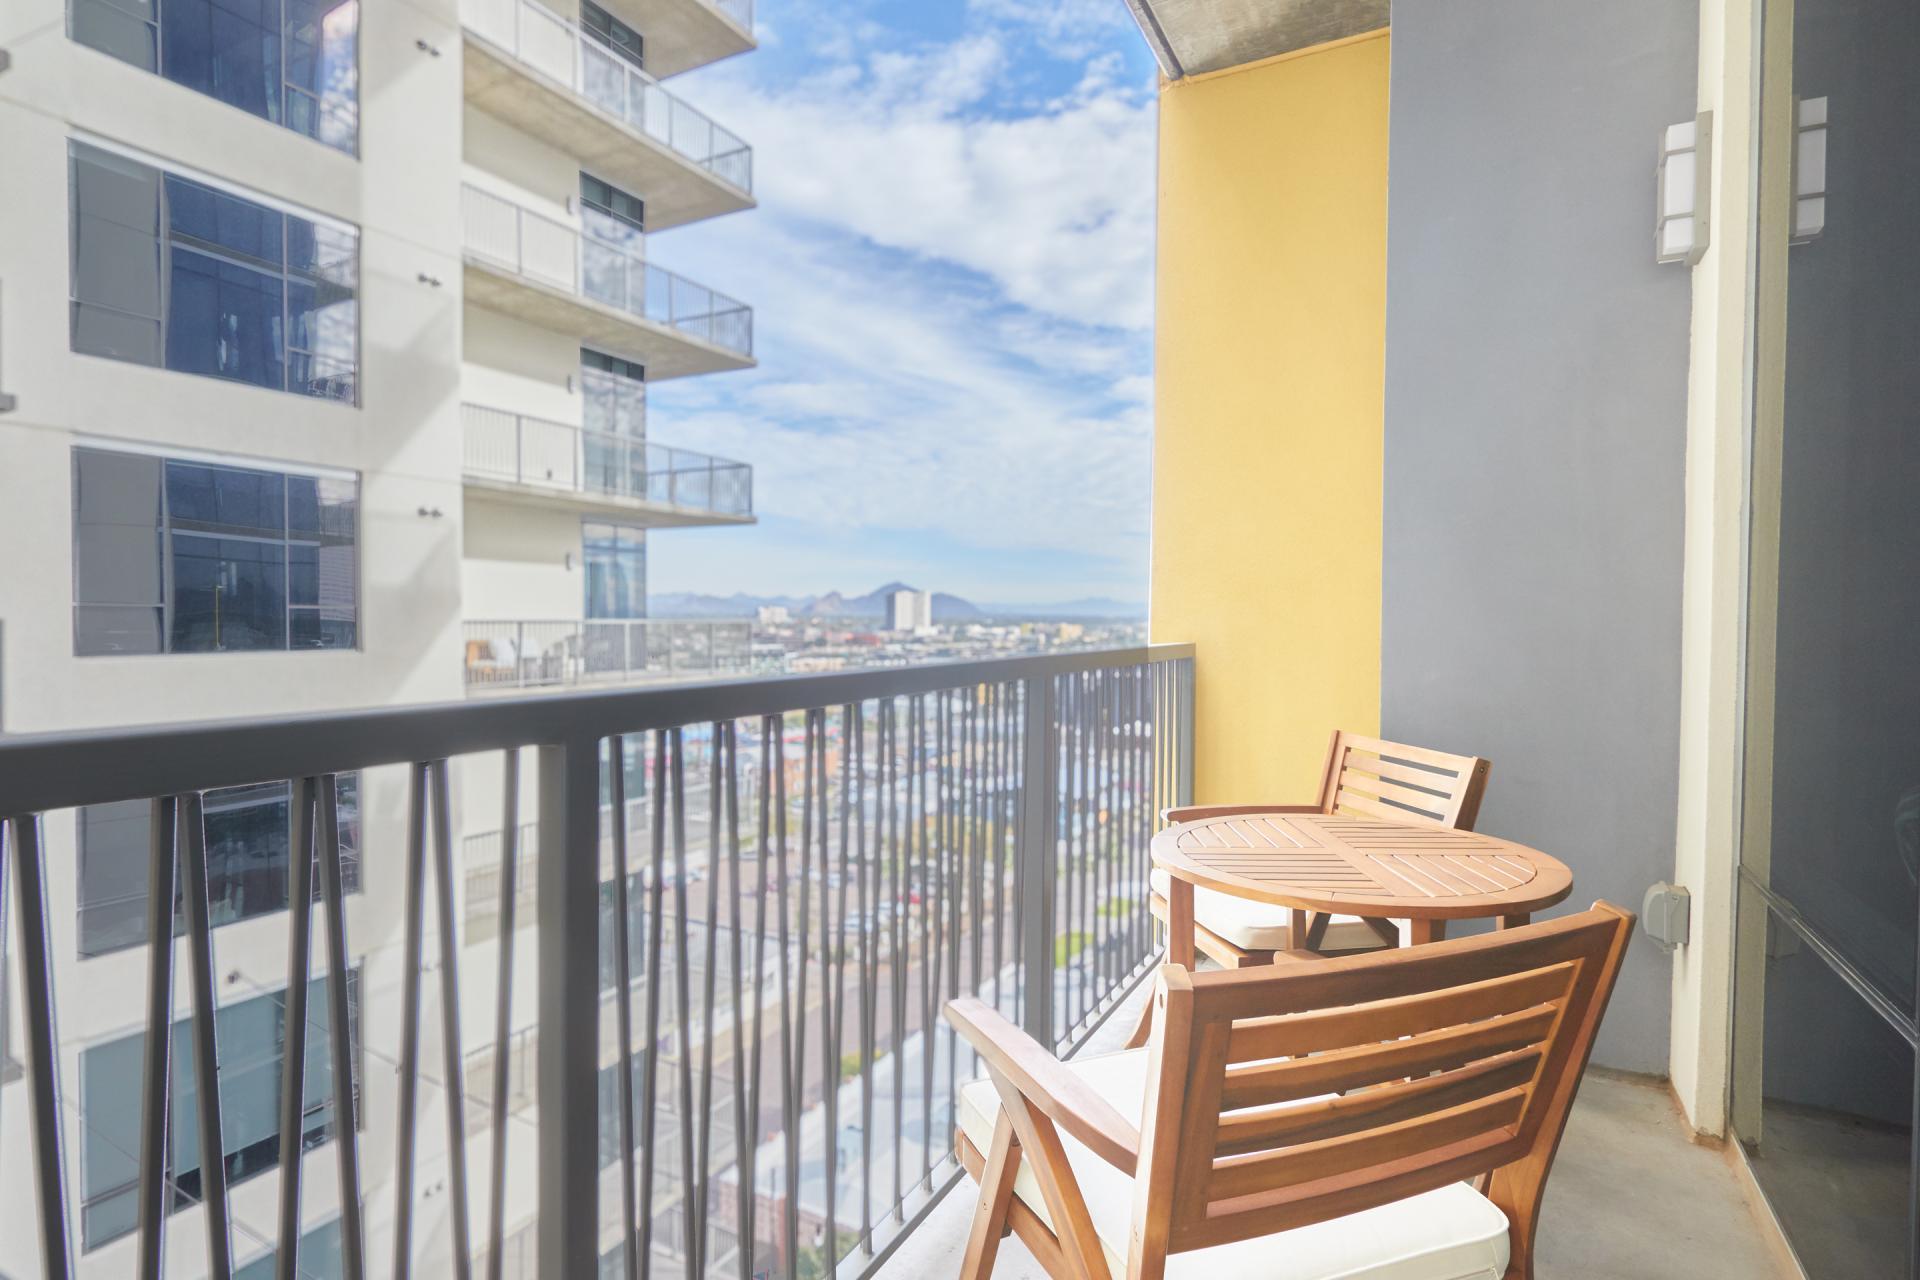 Balcony at McKinley Apartments, Center, Phoenix